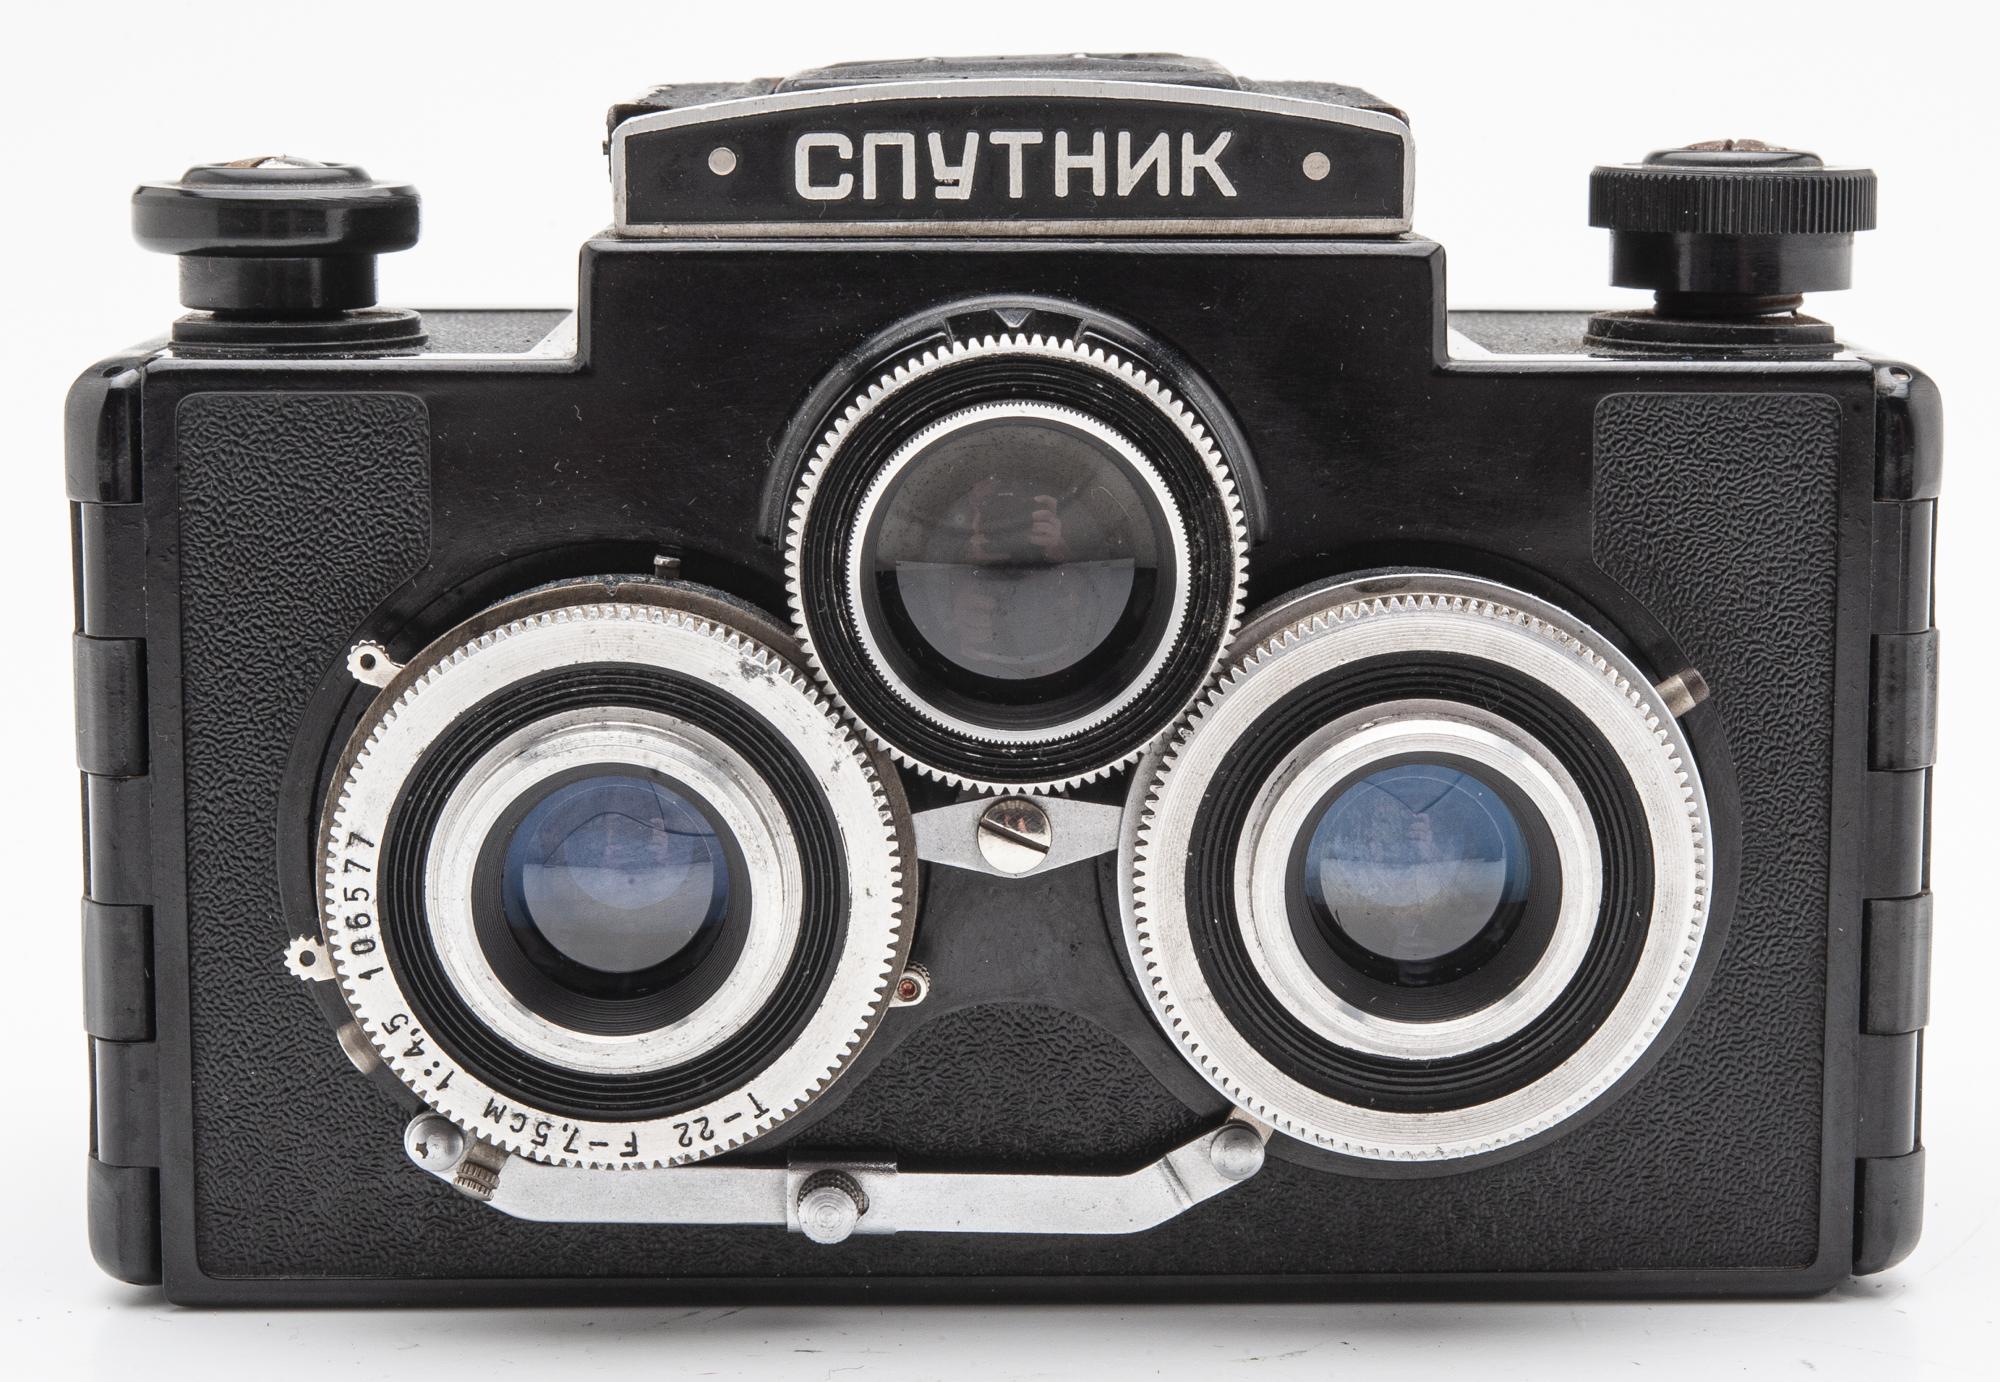 Sputnik russiche Stereokamera 6x6 Kamera Analogkamera - Industar 7,5cm 4.5 Optik